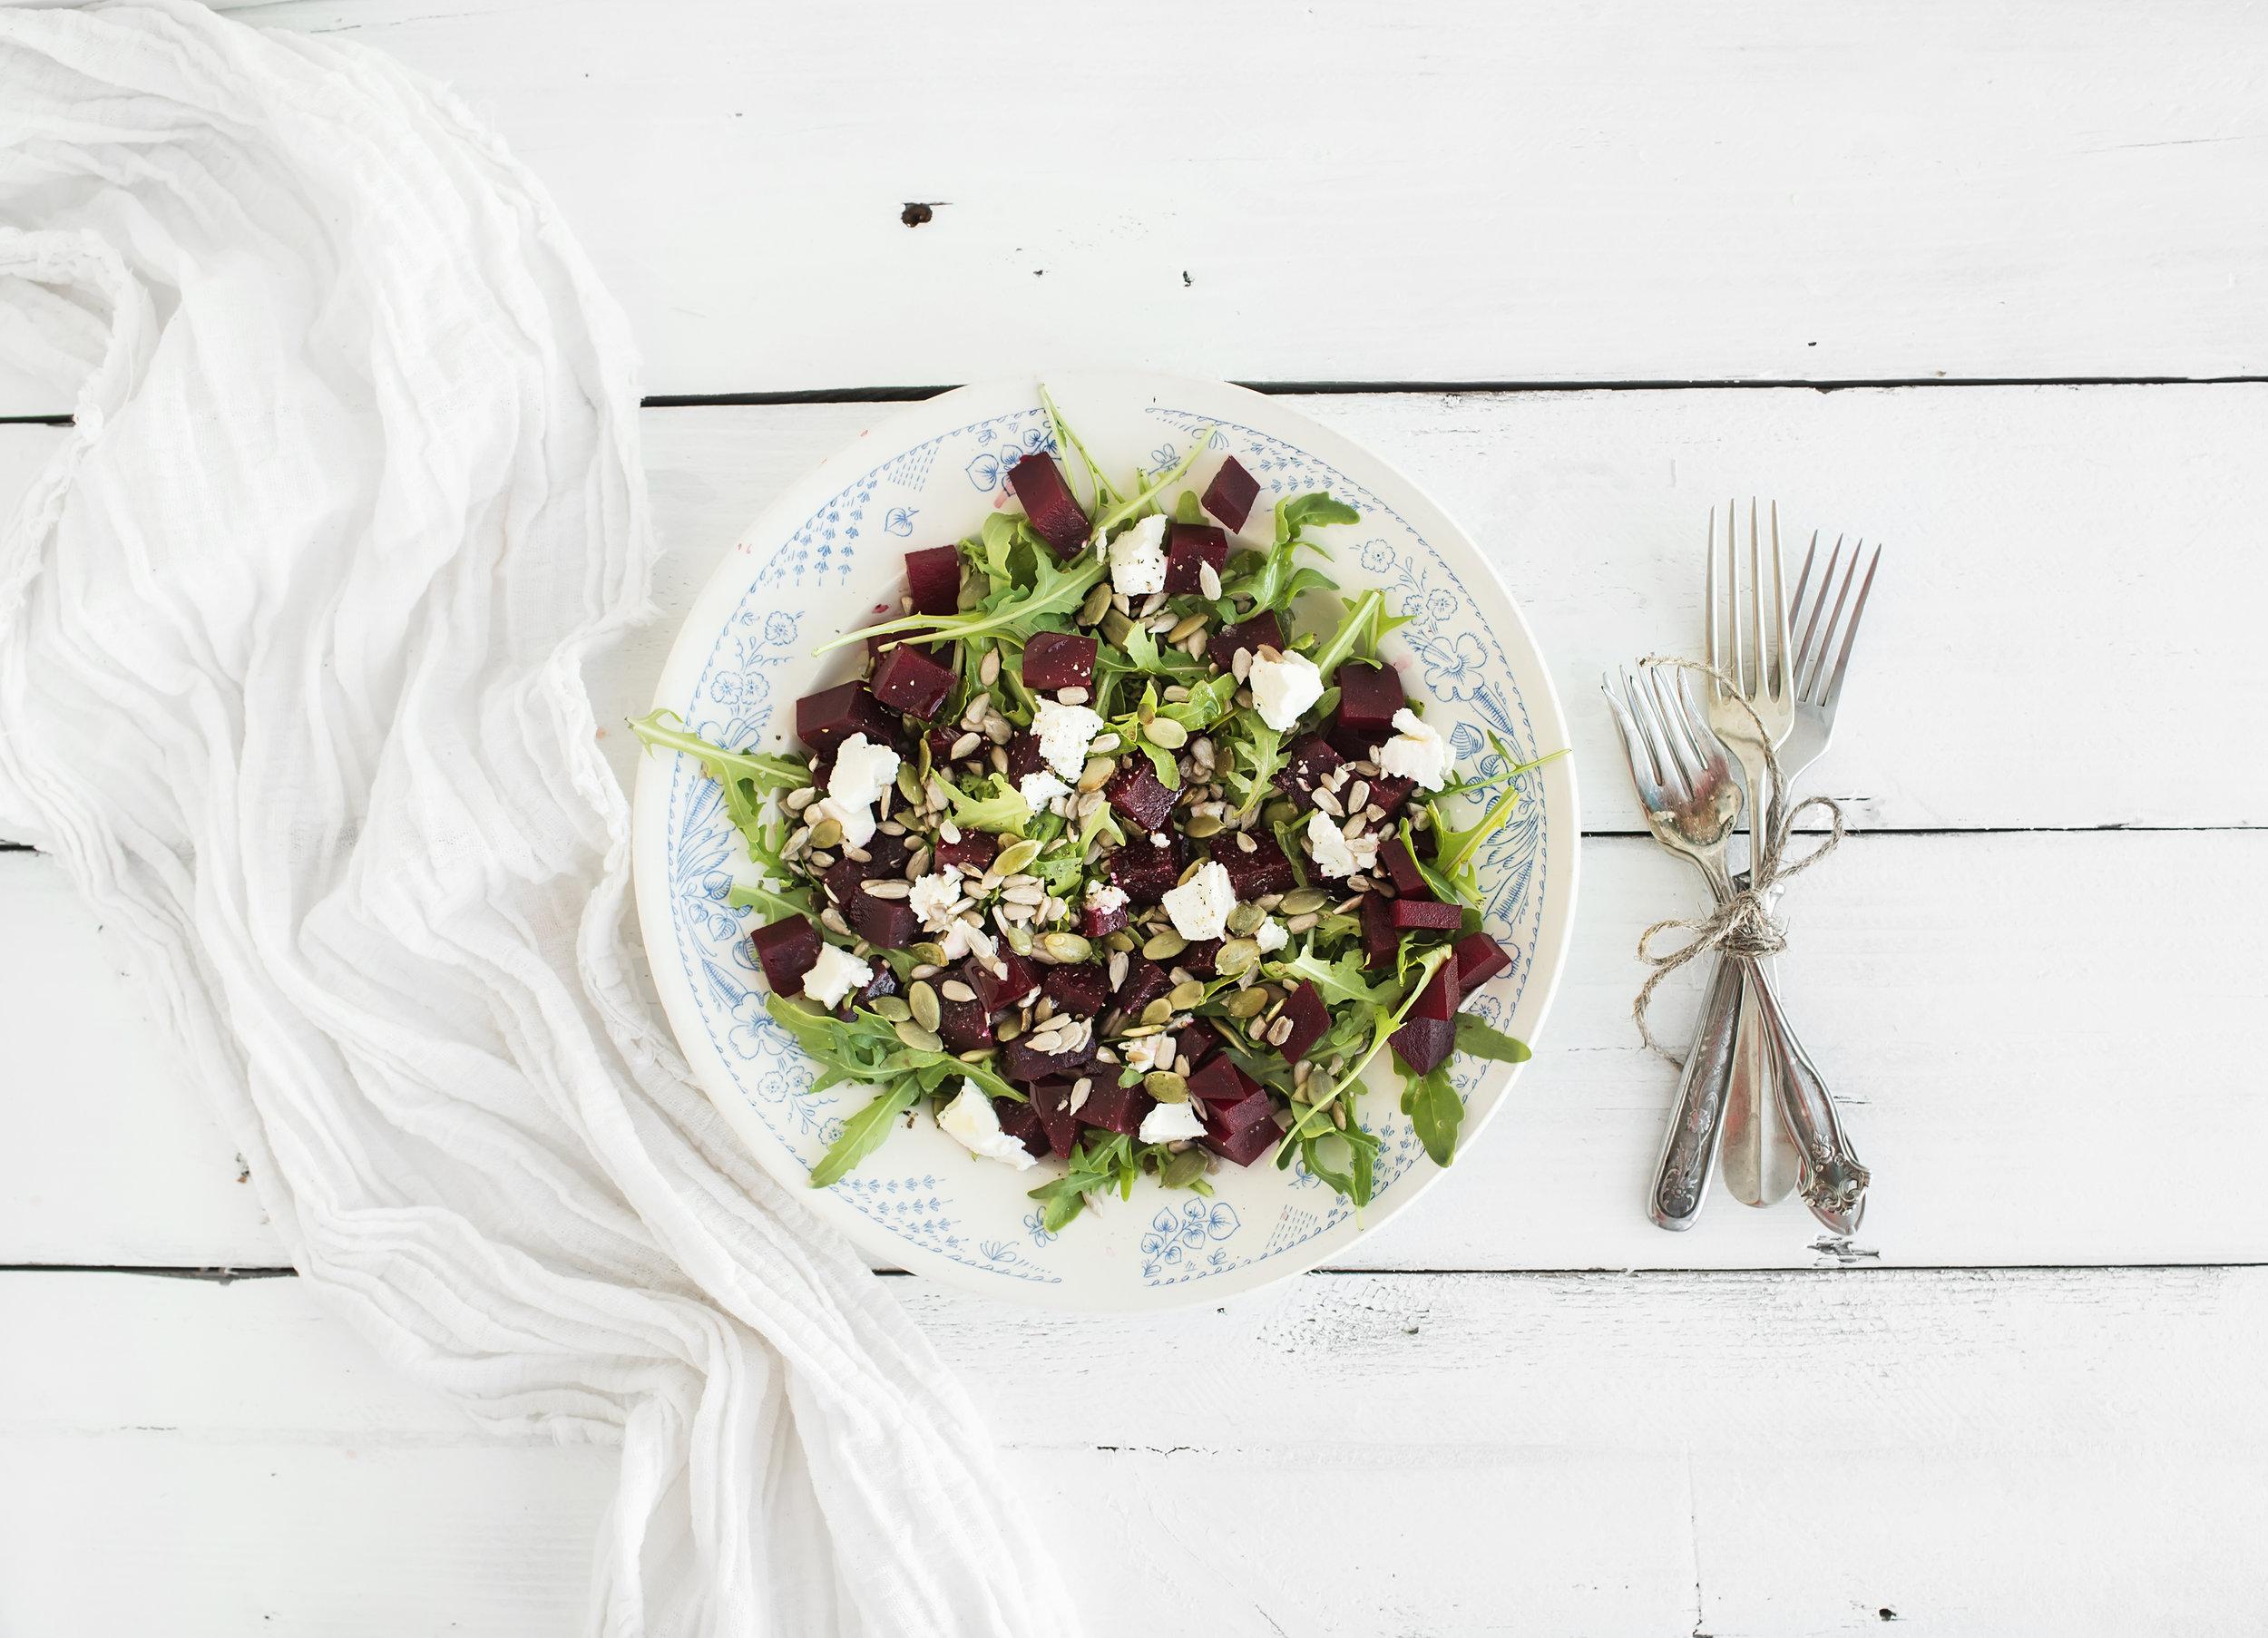 It's simple.Great ingredients make great food. -